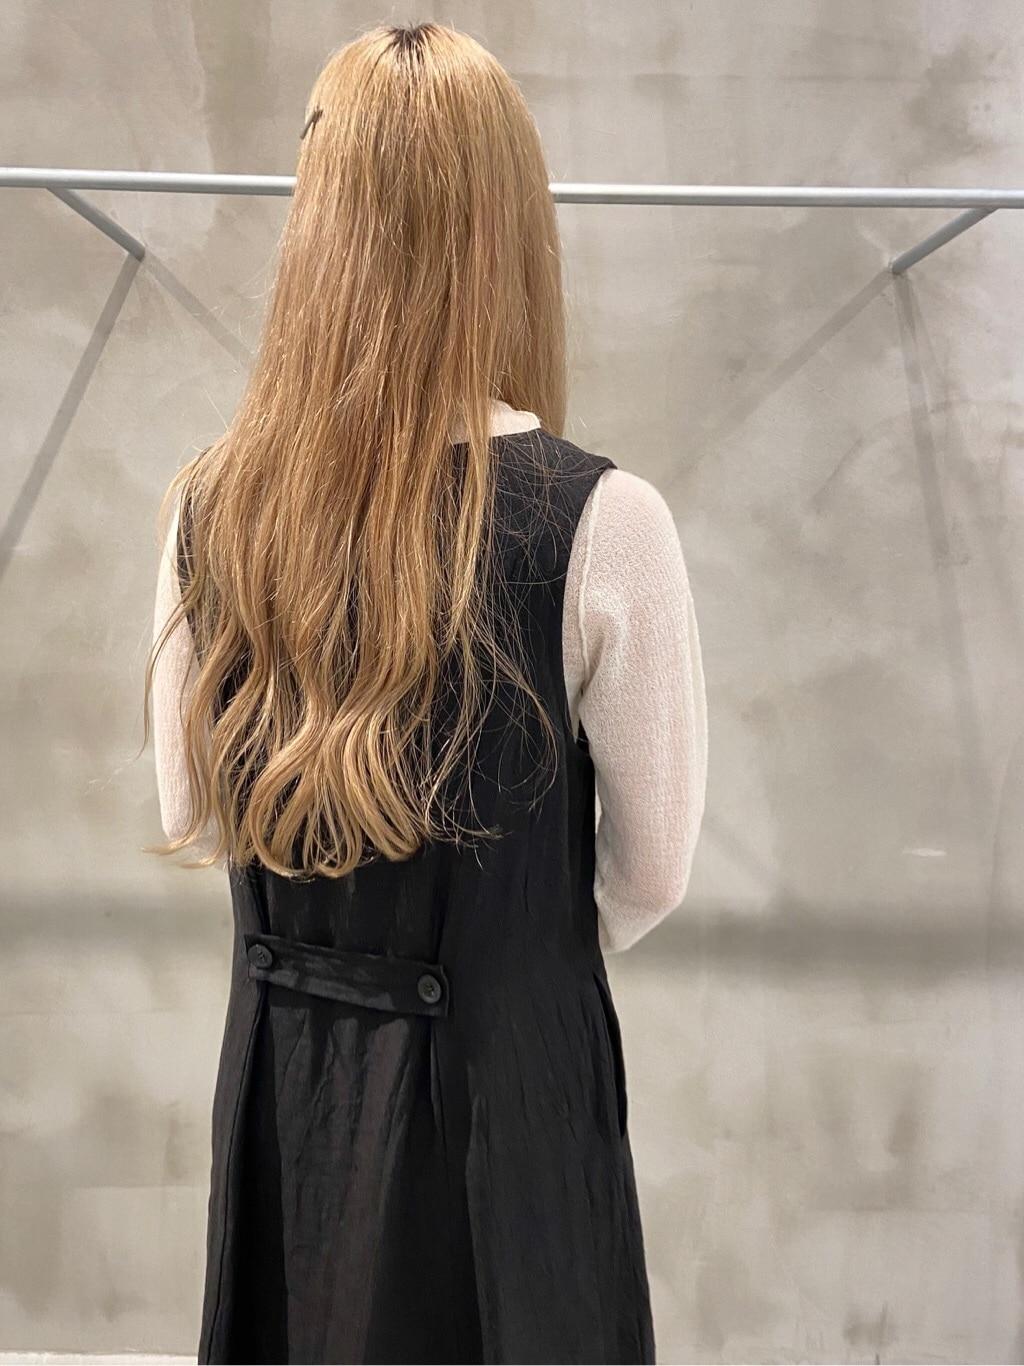 bulle de savon 渋谷スクランブルスクエア 身長:160cm 2020.09.26